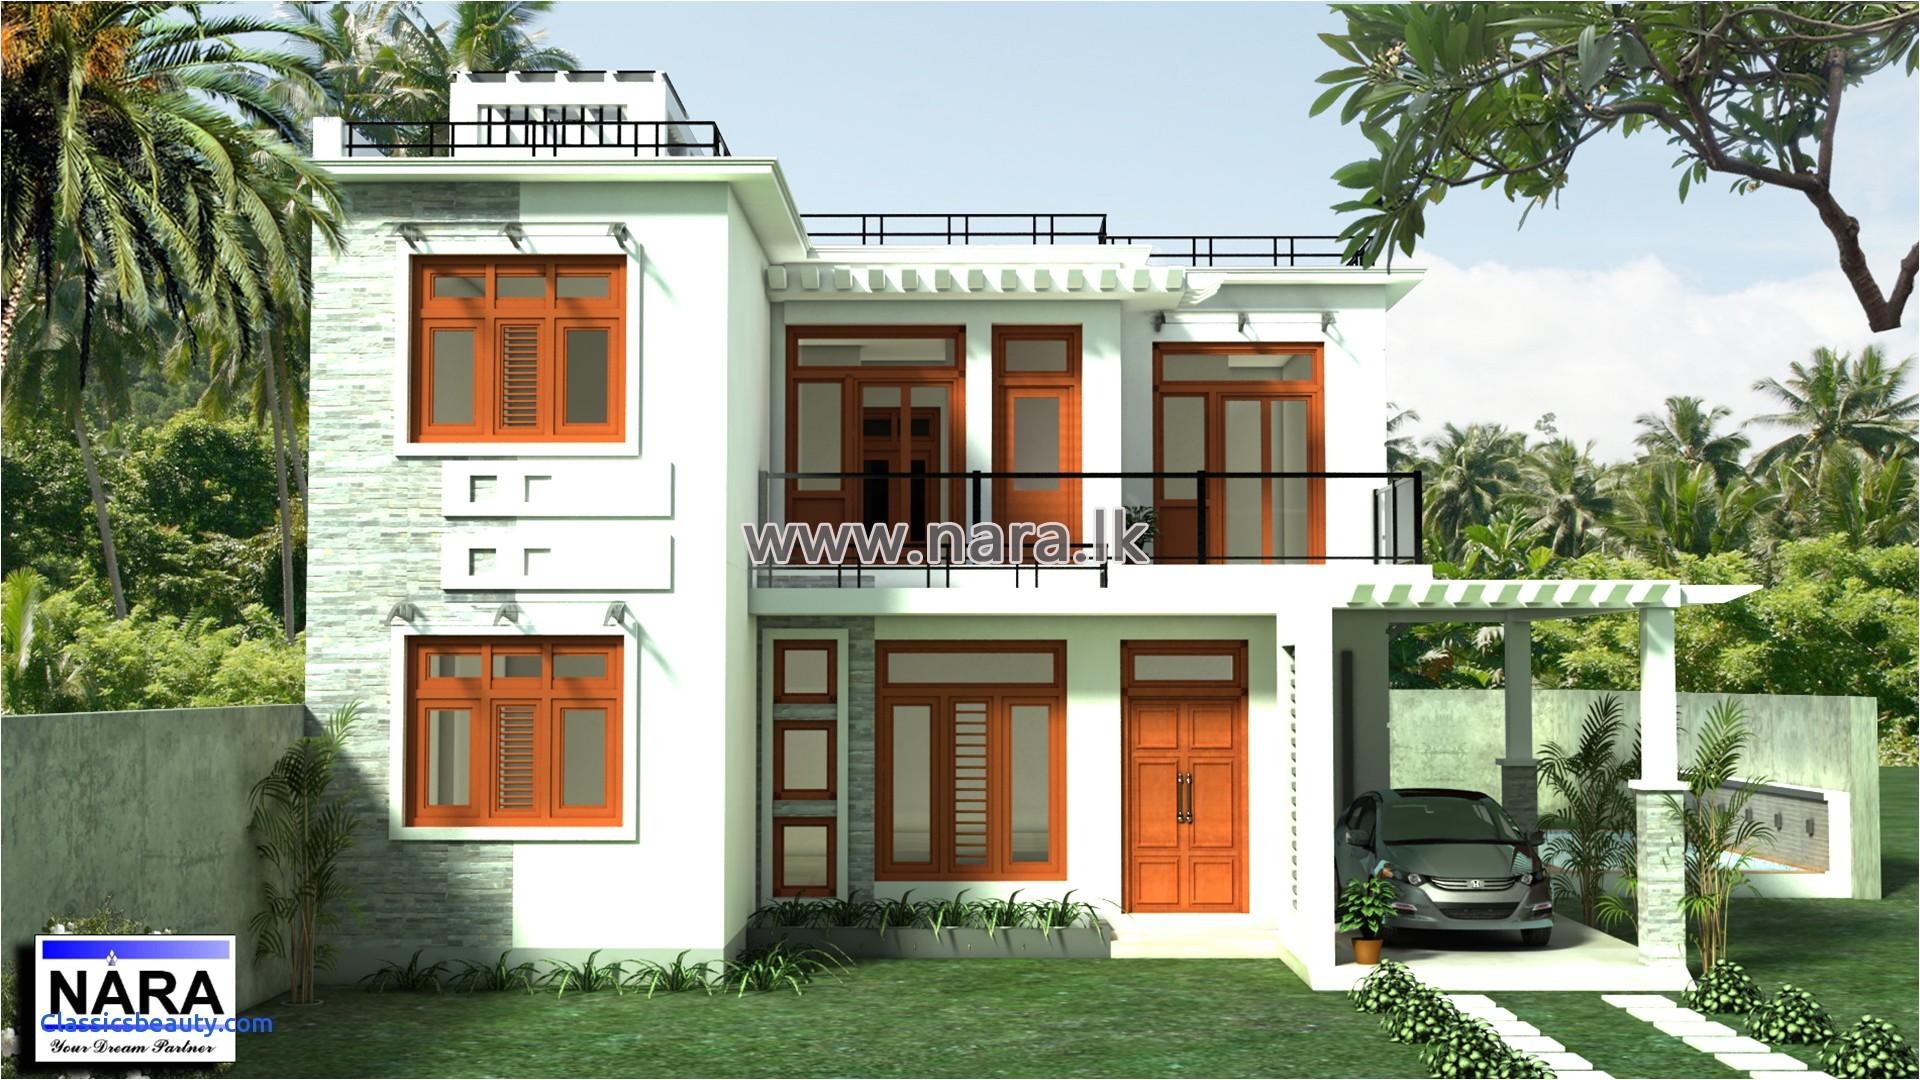 new home plans unique modern house plans designs in sri lanka youtube plan design